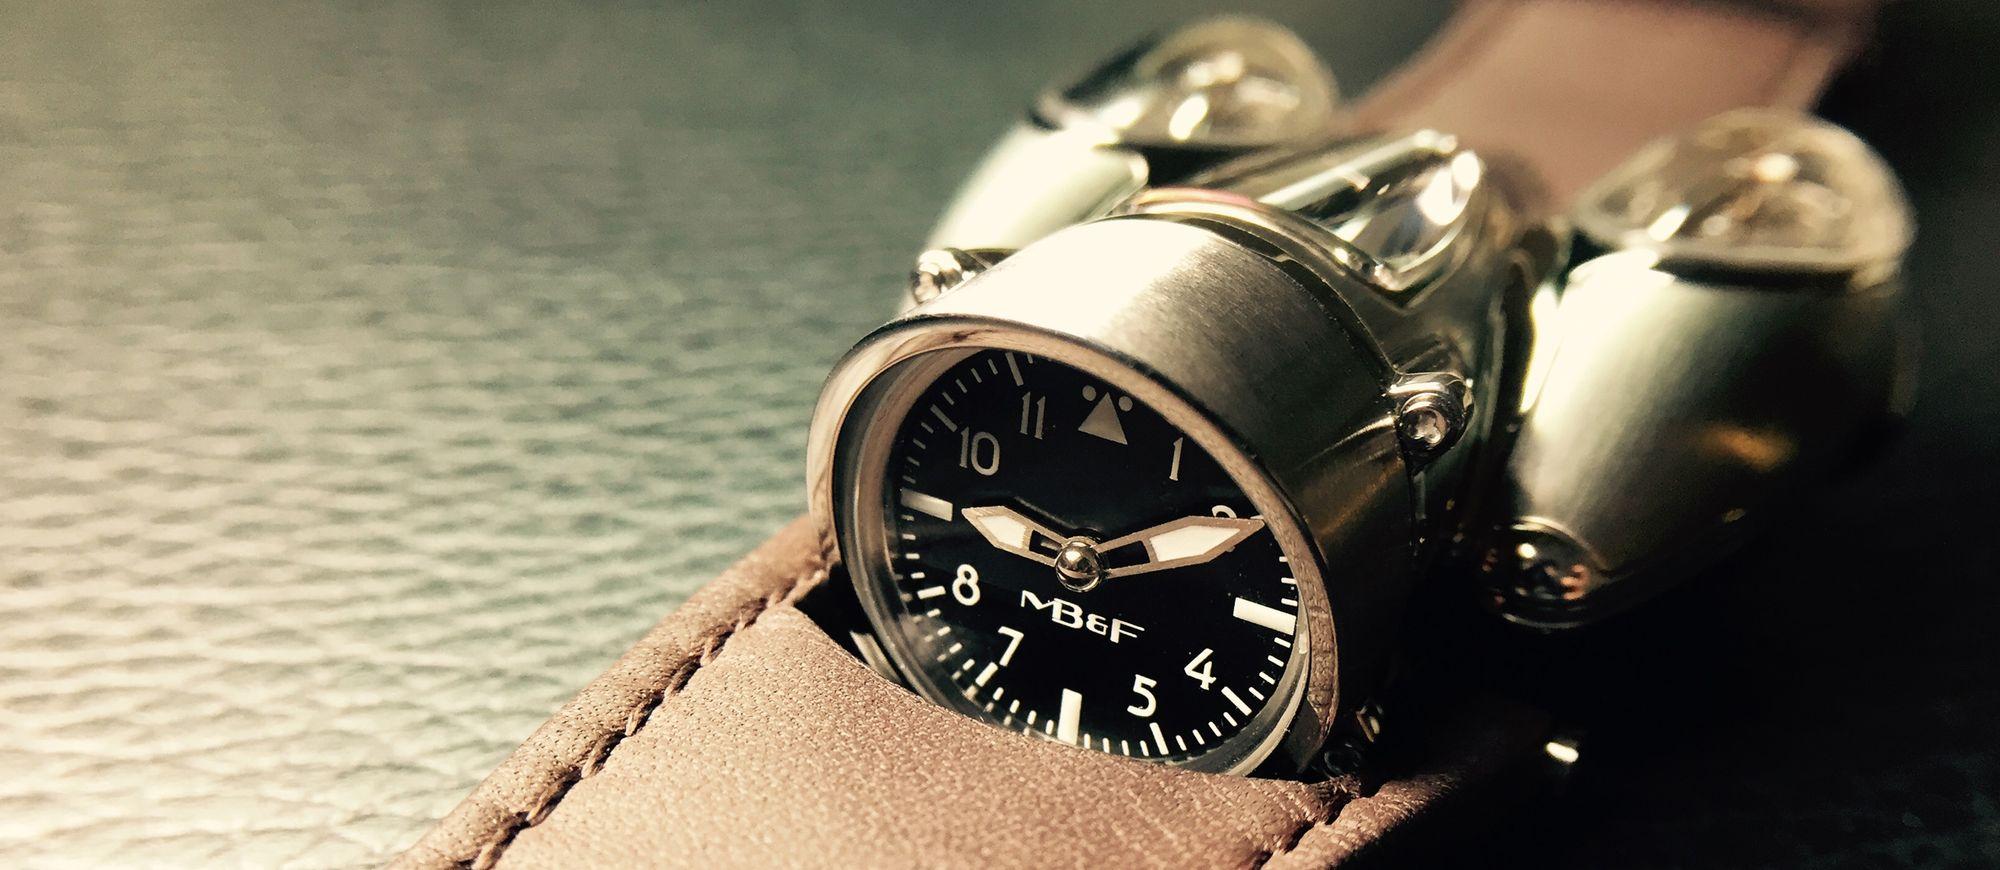 【每週一錶】MB&F Horological Machine No. 9:一只準備起飛的錶